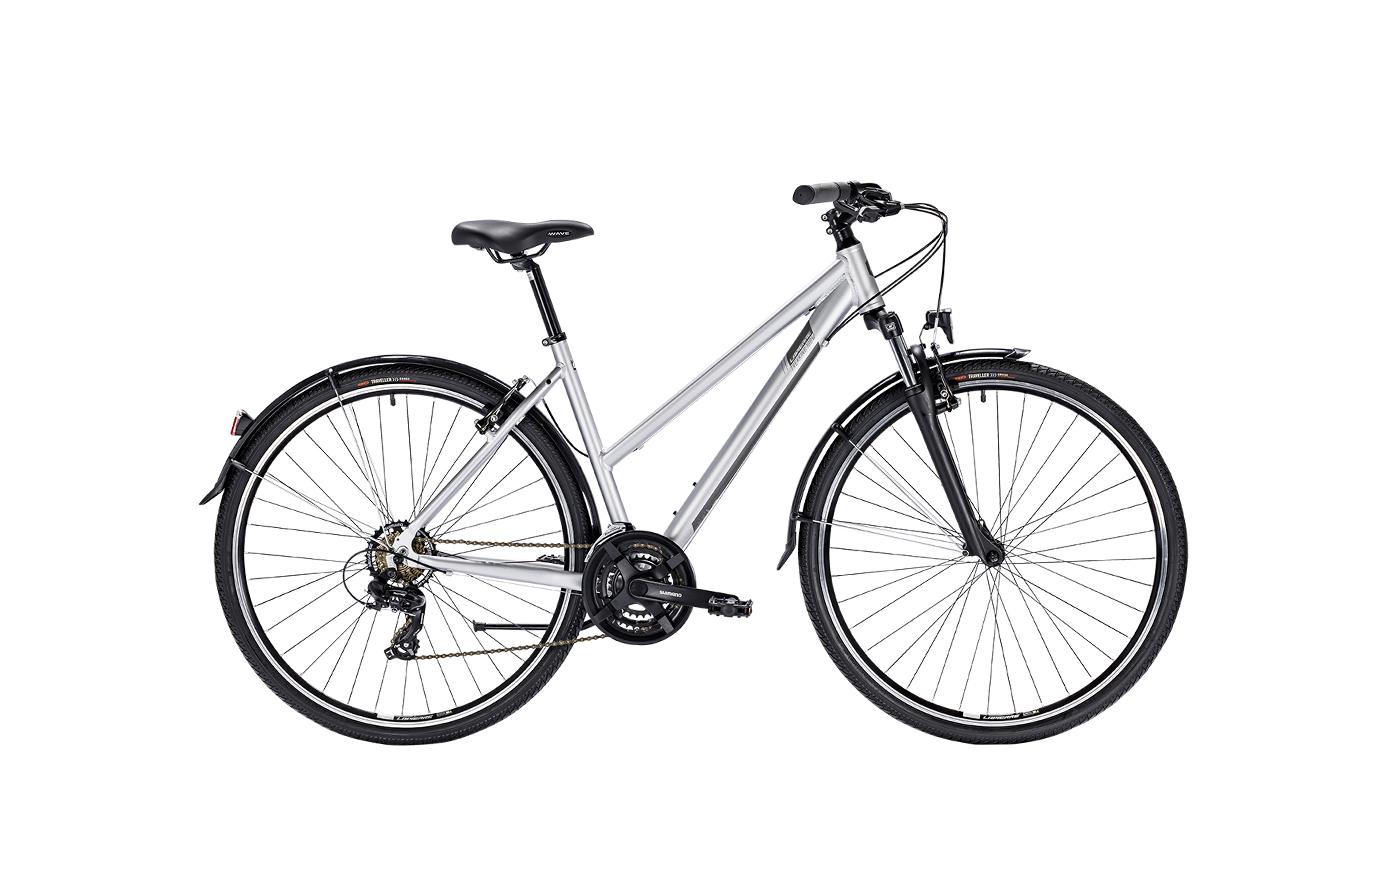 Bicykel LAPIERRE TREKKING 100 W 2018